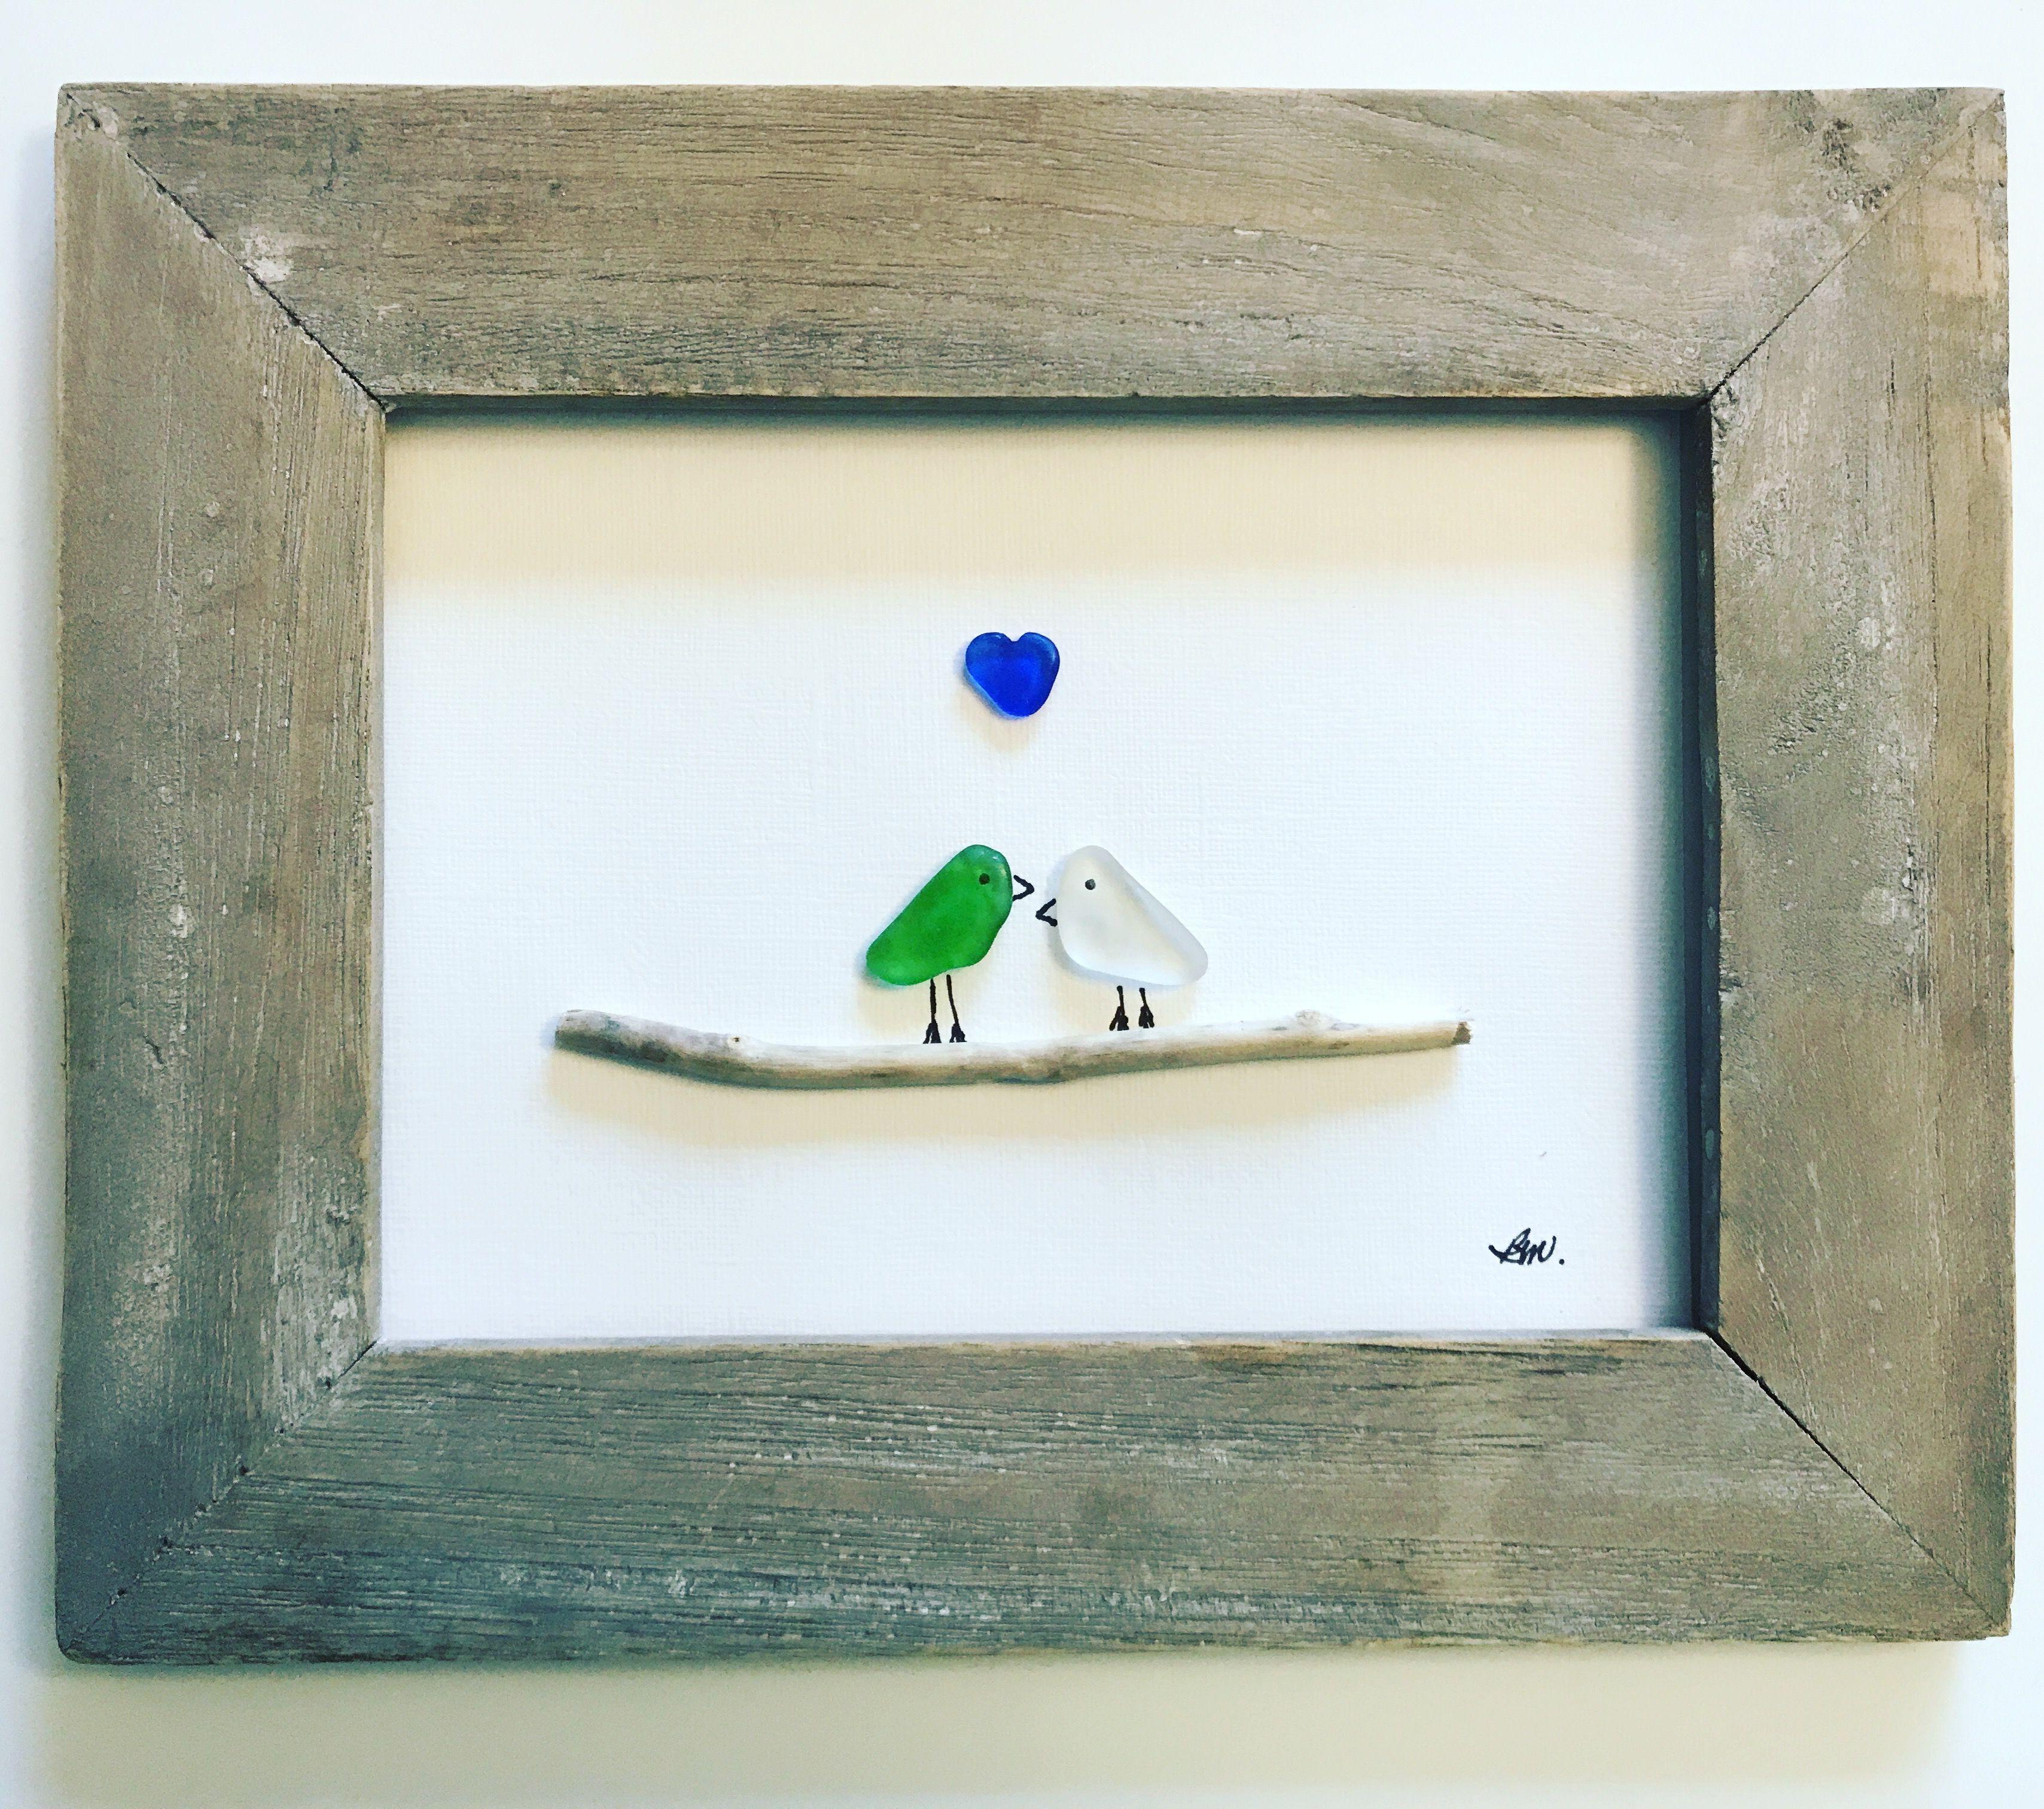 Pin de Jill Price en Sea glass | Pinterest